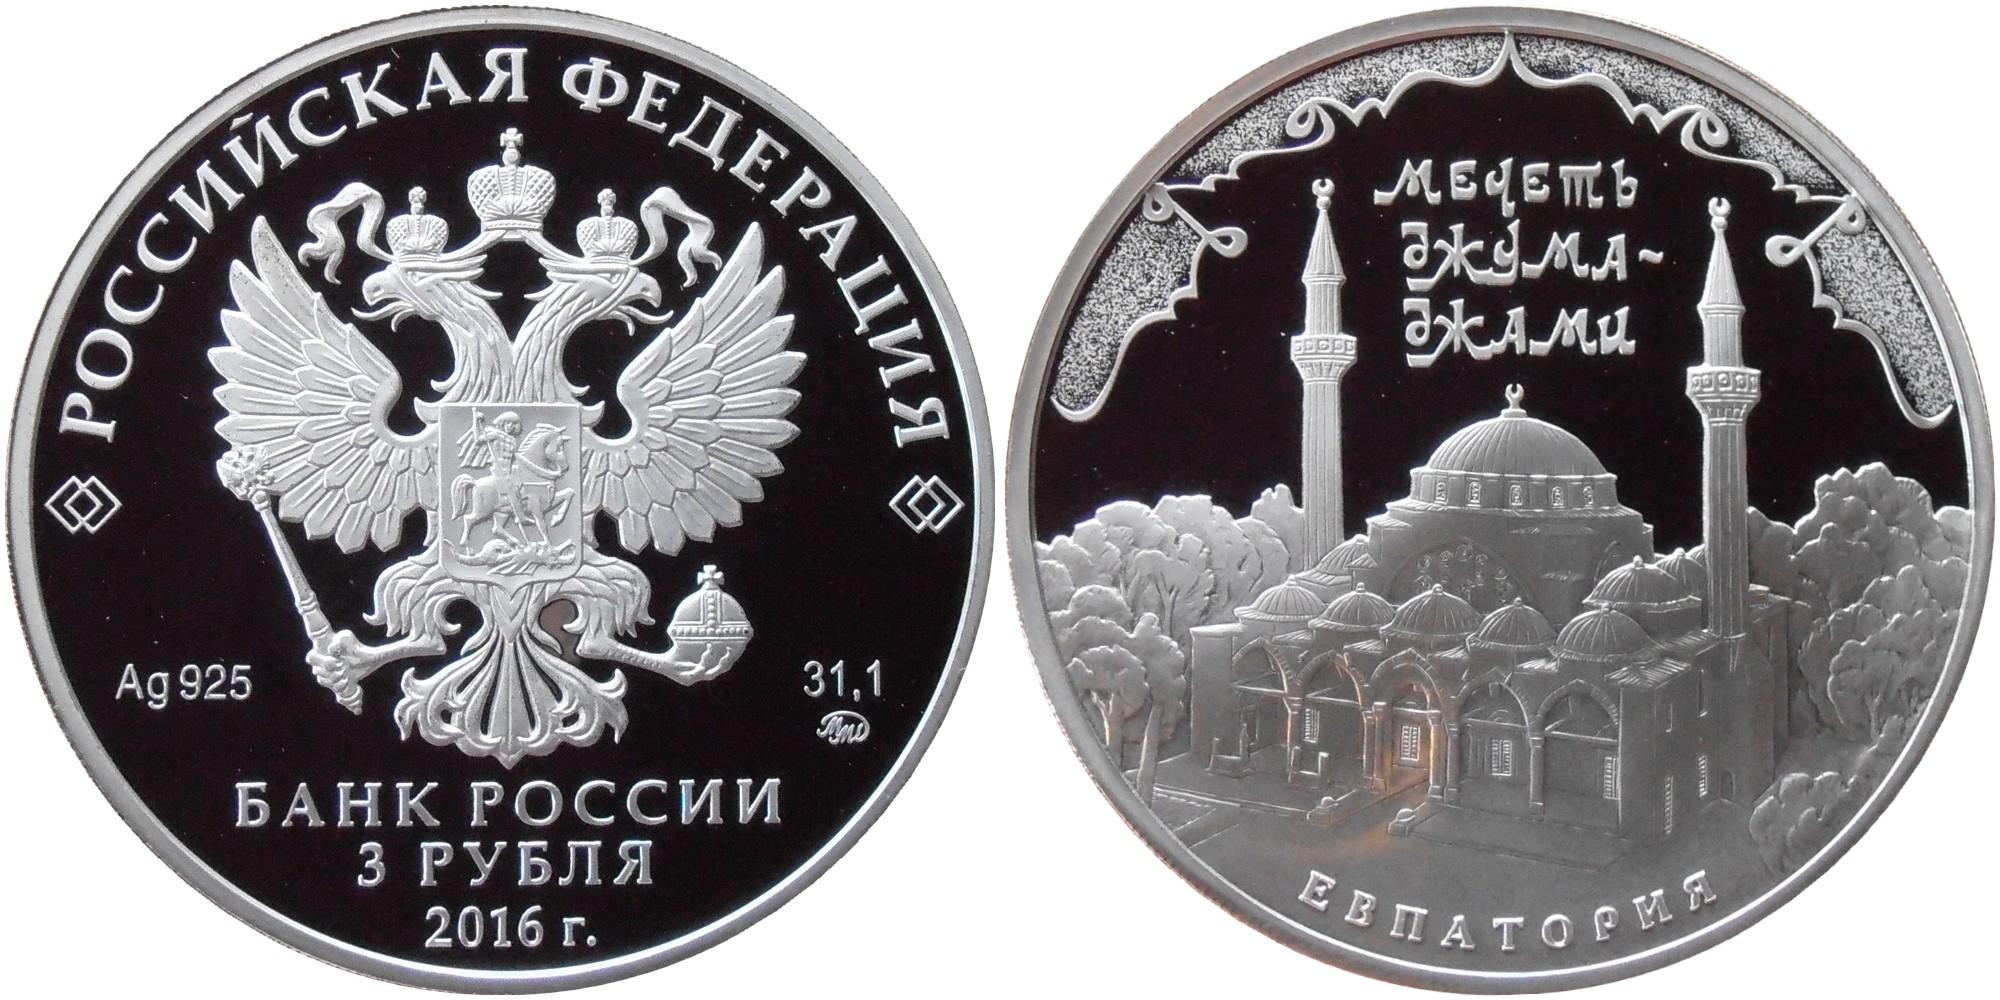 RUSSIE 3 ROUBLES 2016 - MOSQUEE JUMA-JAMI